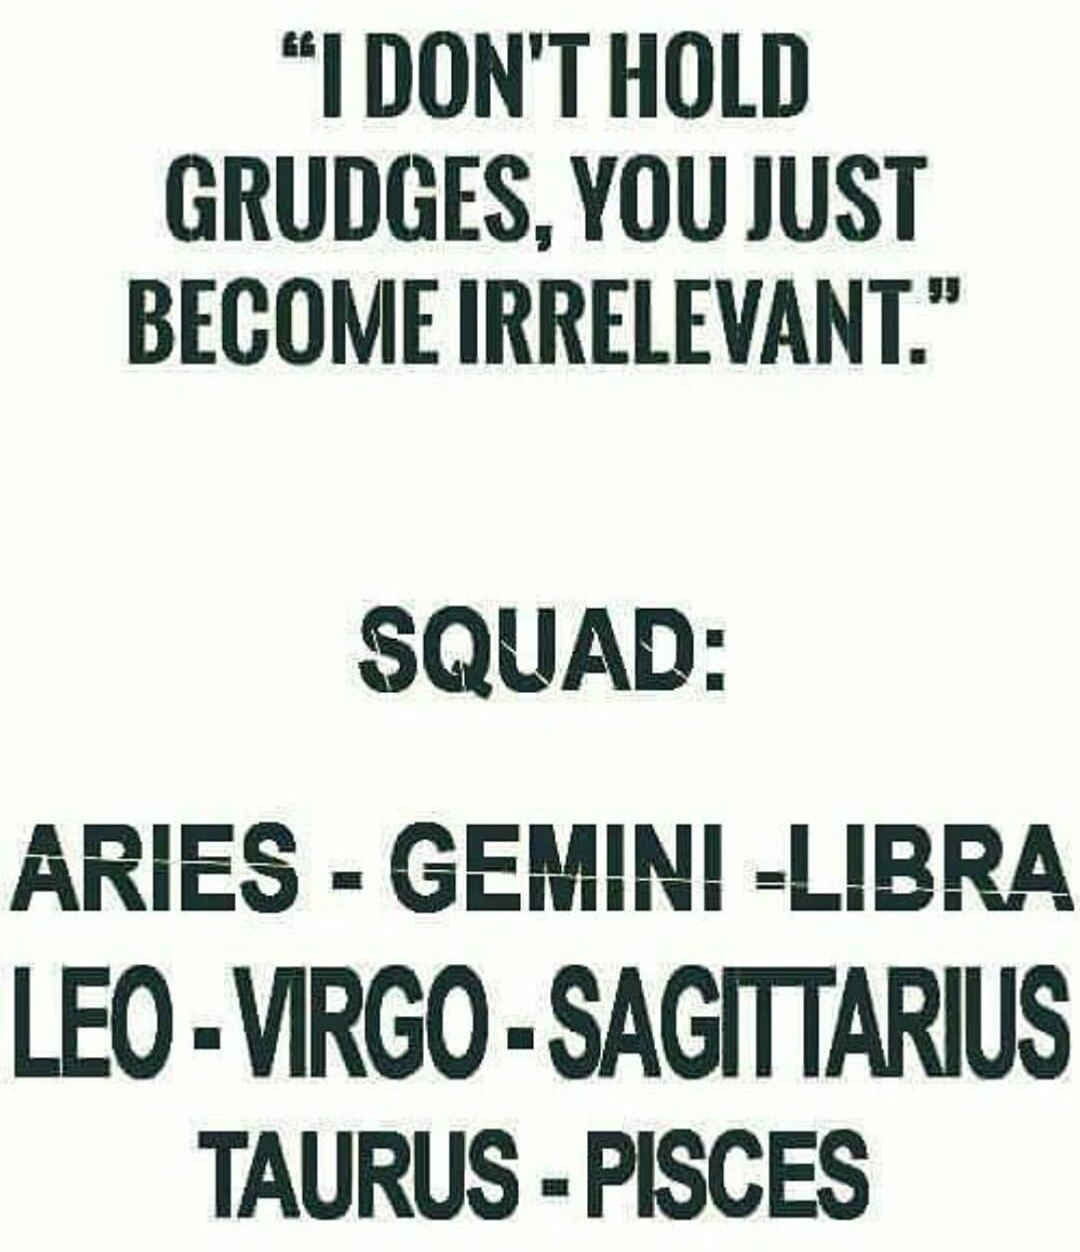 Maybe a bit of semantics here    I'm a Gemini and I hold a